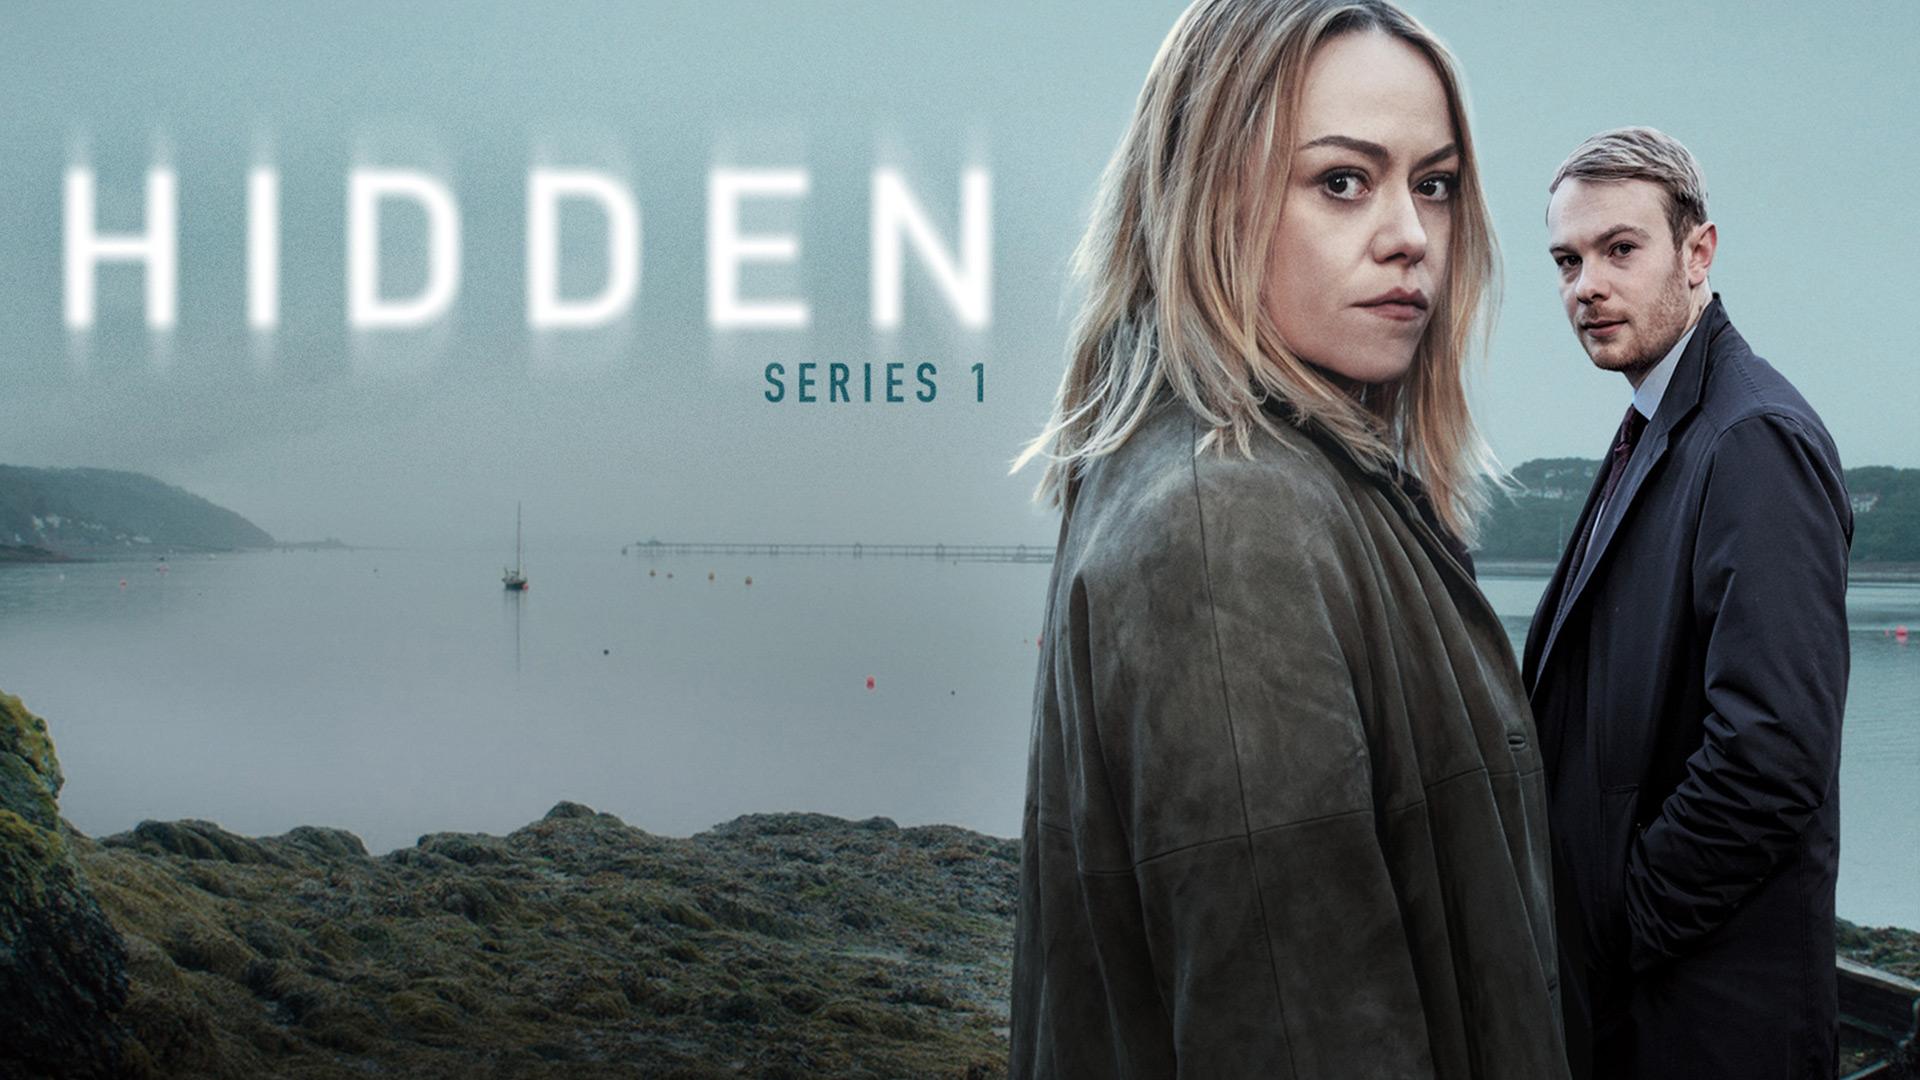 Hidden - Series 1